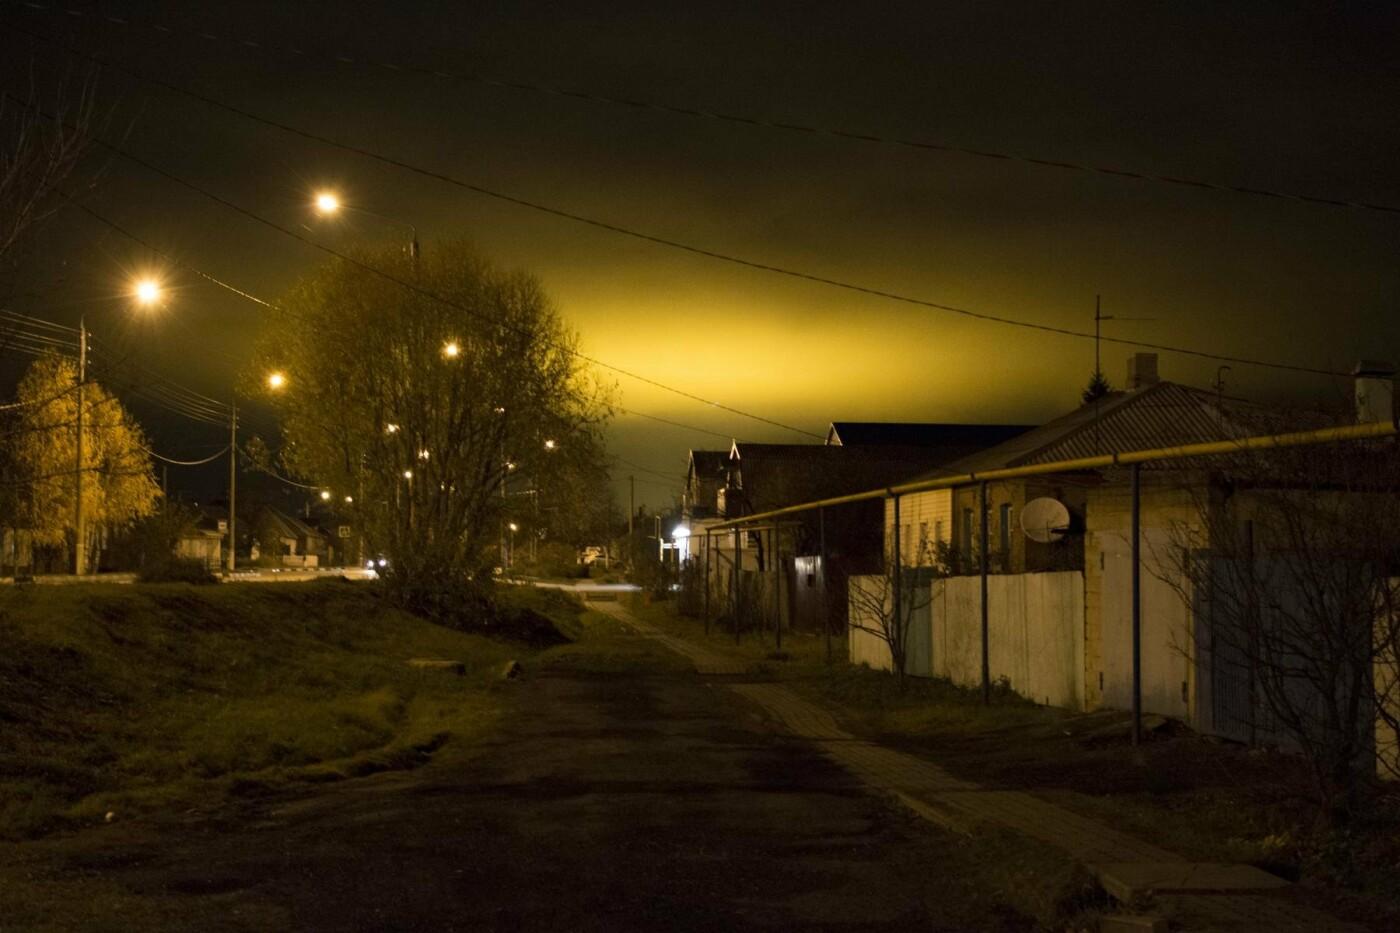 Тайна белгородского сияния. Кому вредит зарево от теплиц, фото-2